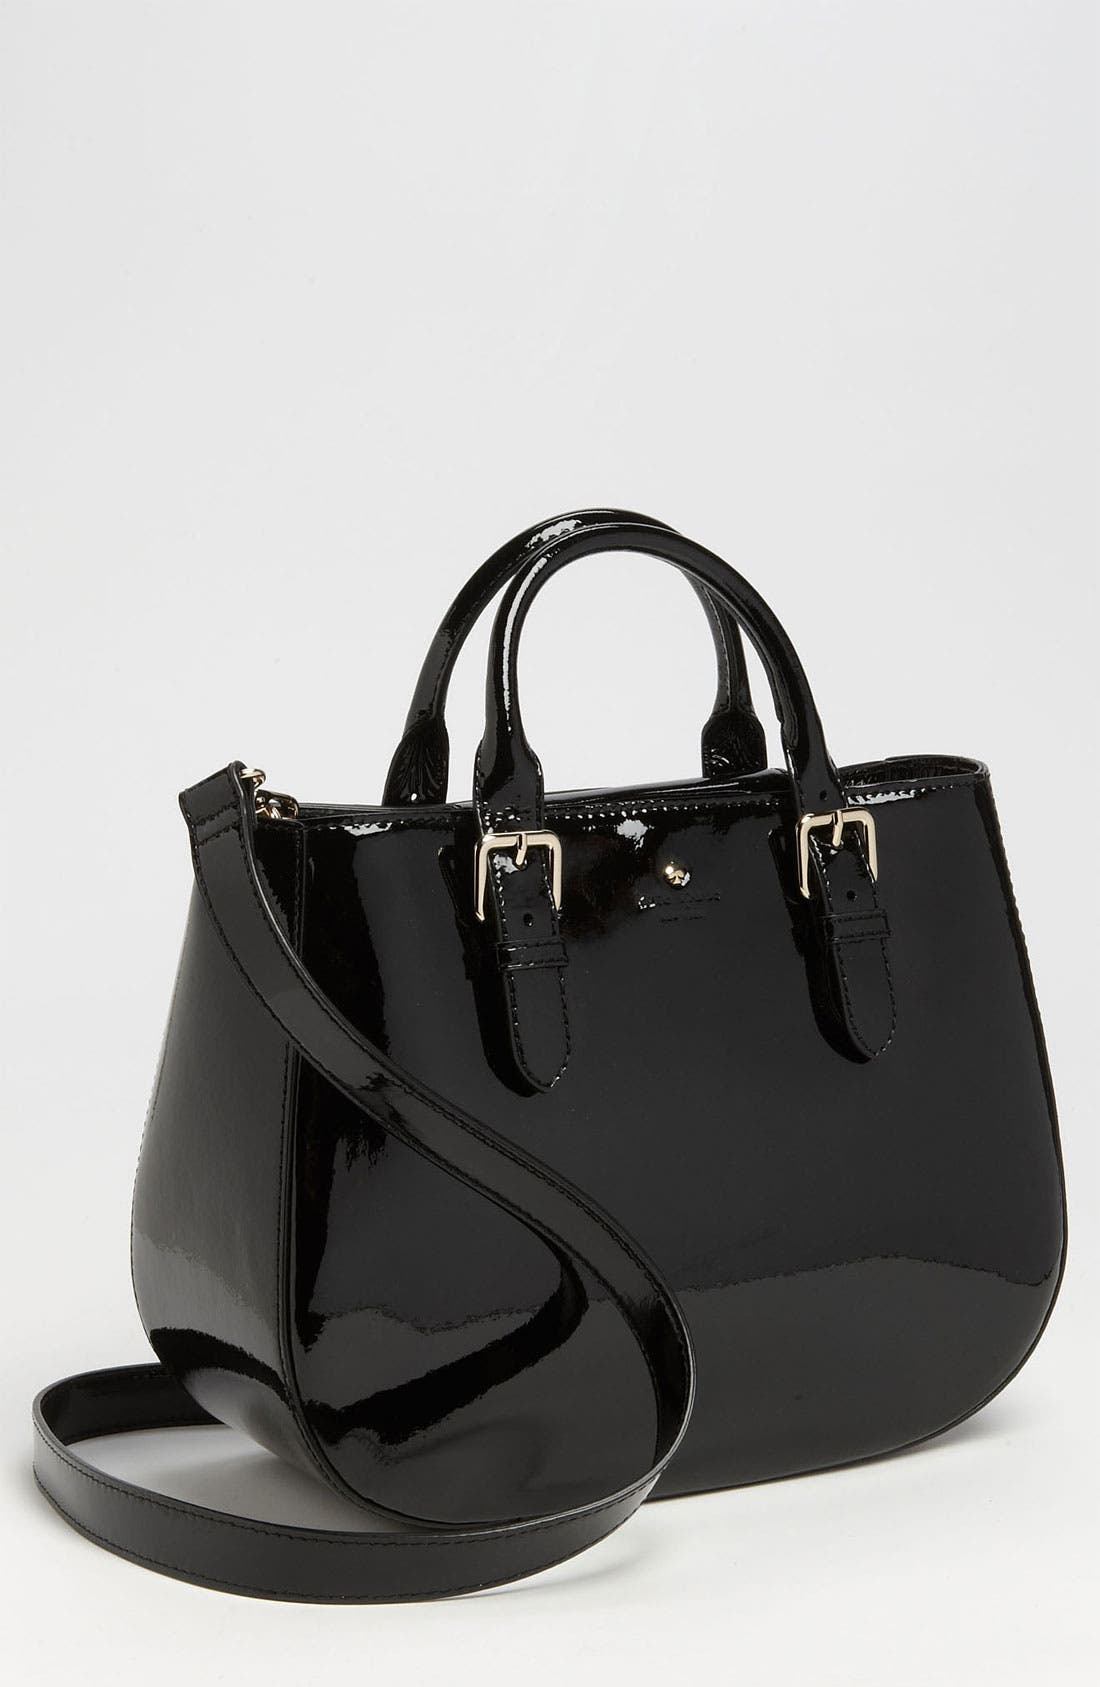 Main Image - kate spade new york 'carlisle street - sylvie' handbag